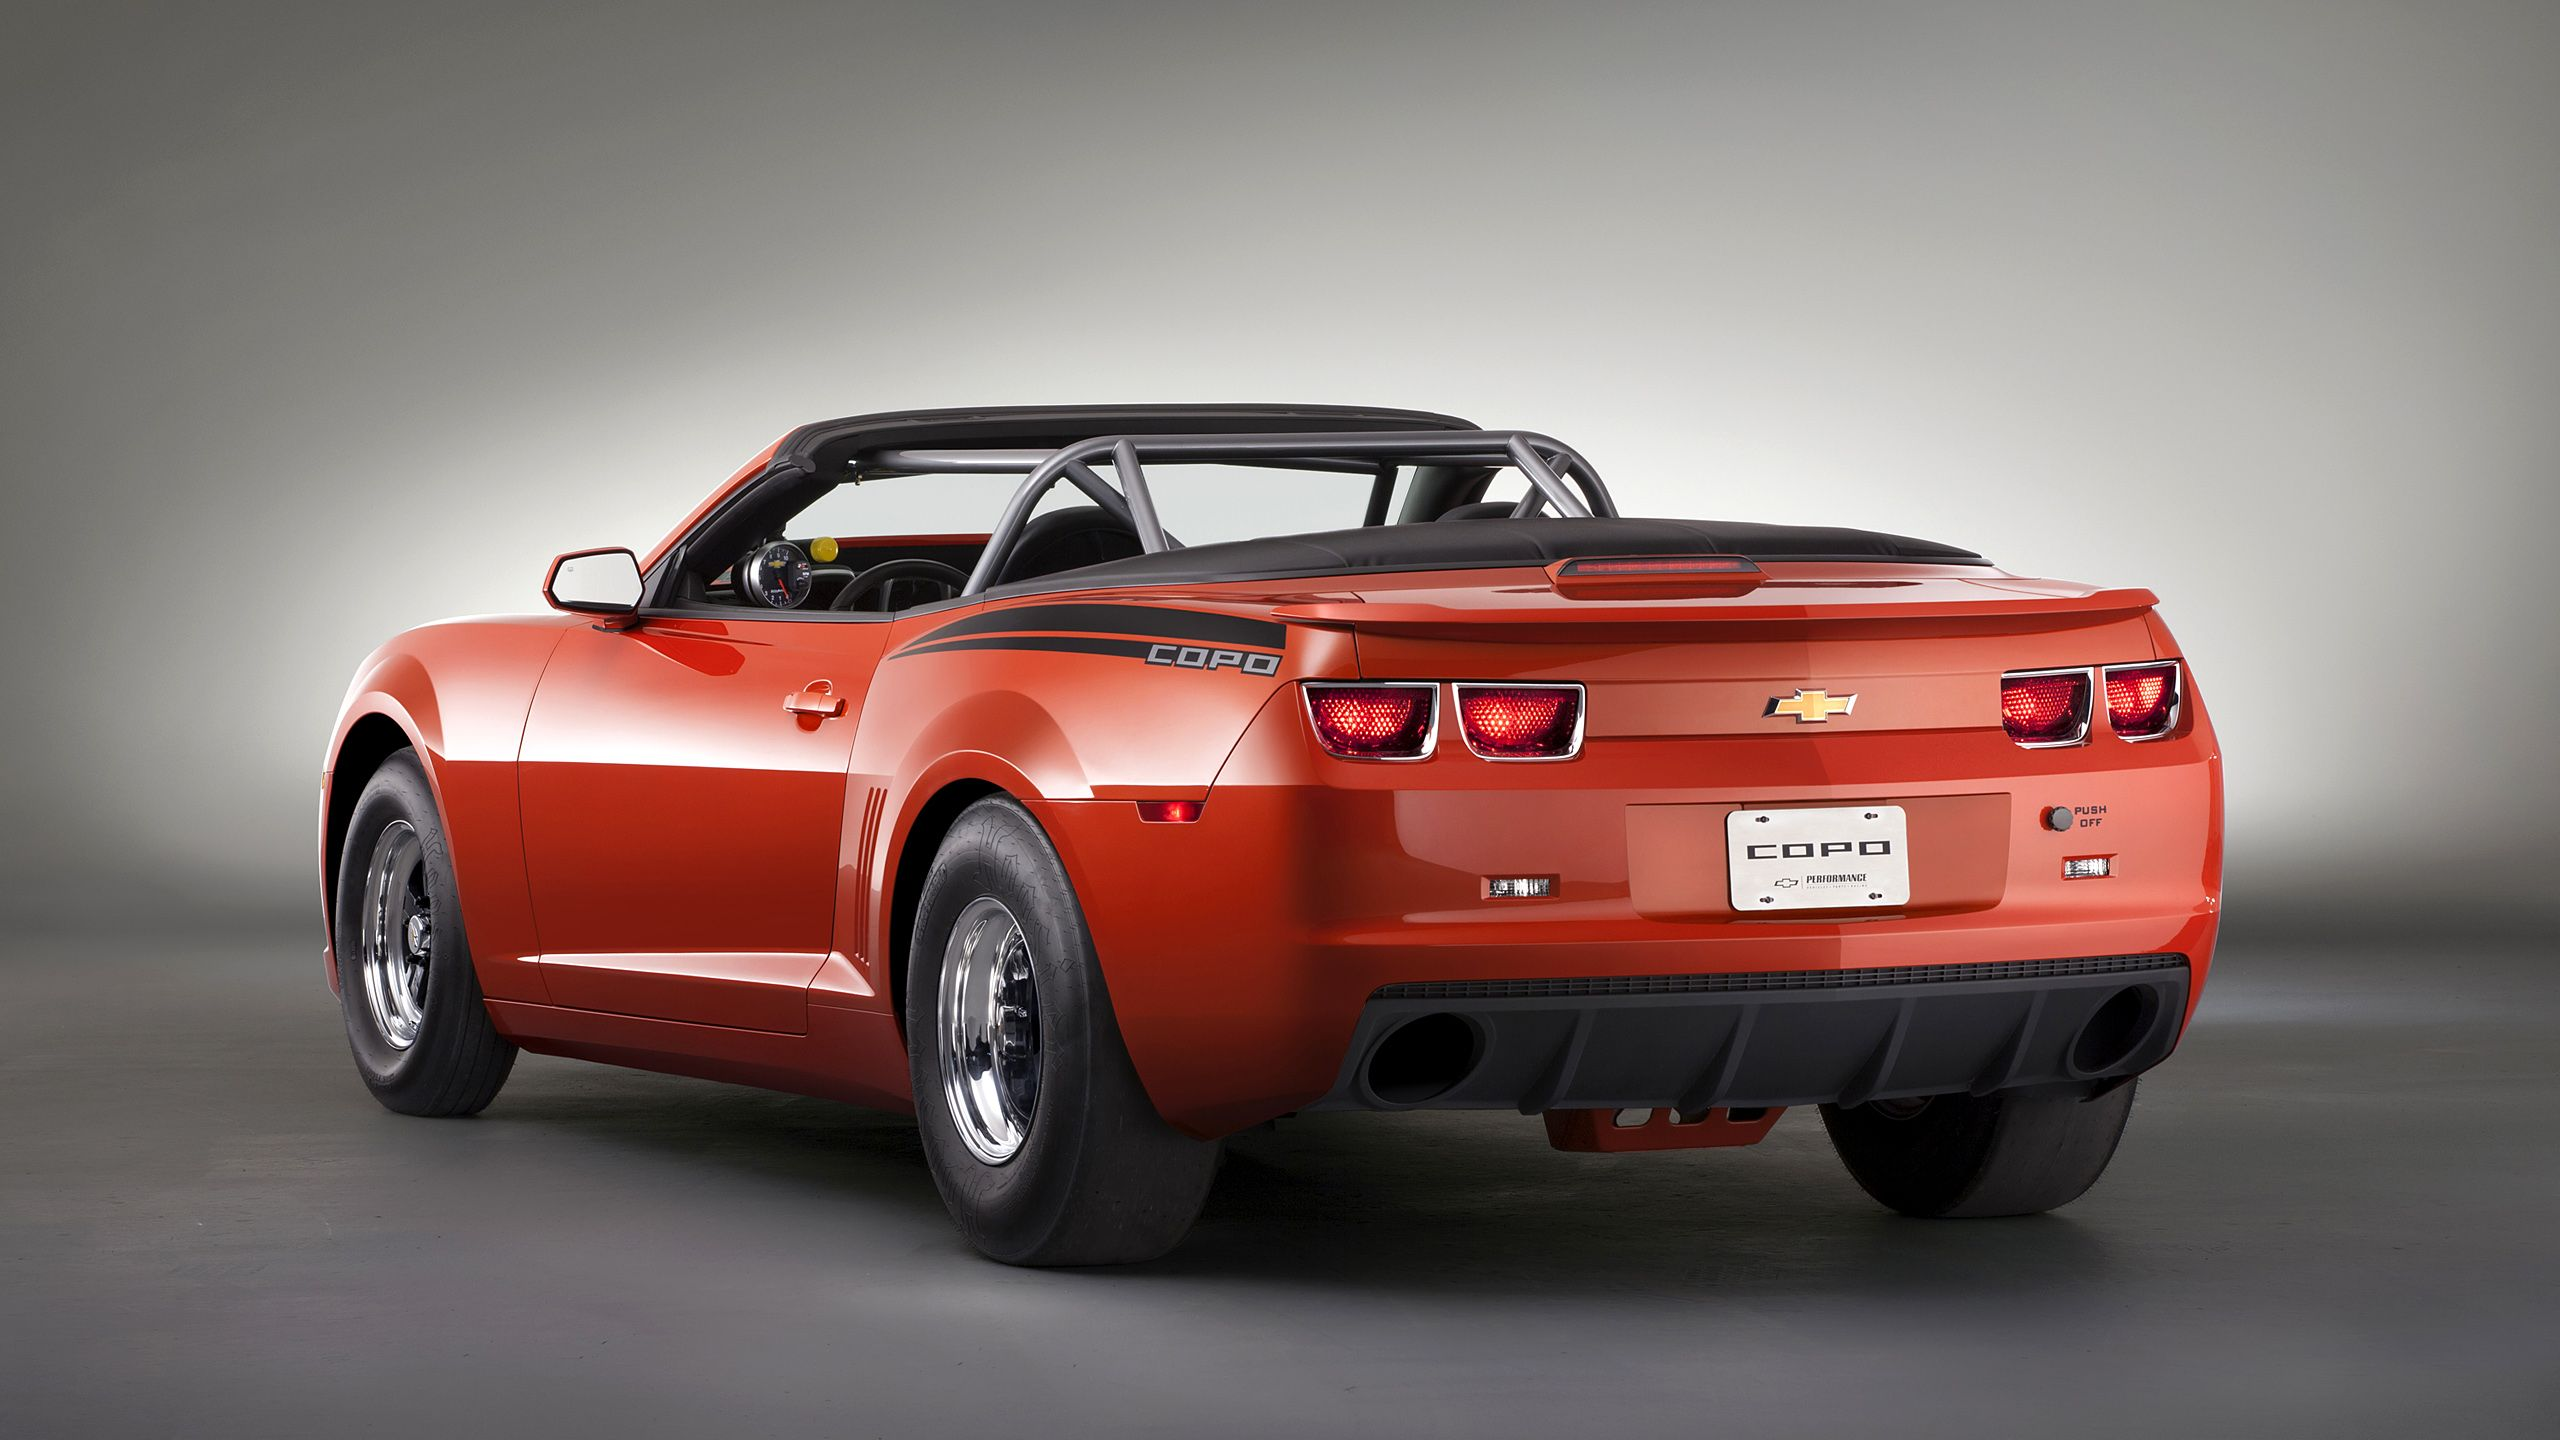 2012 Camaro COPO Convertible-5.3L V8 Supercharged